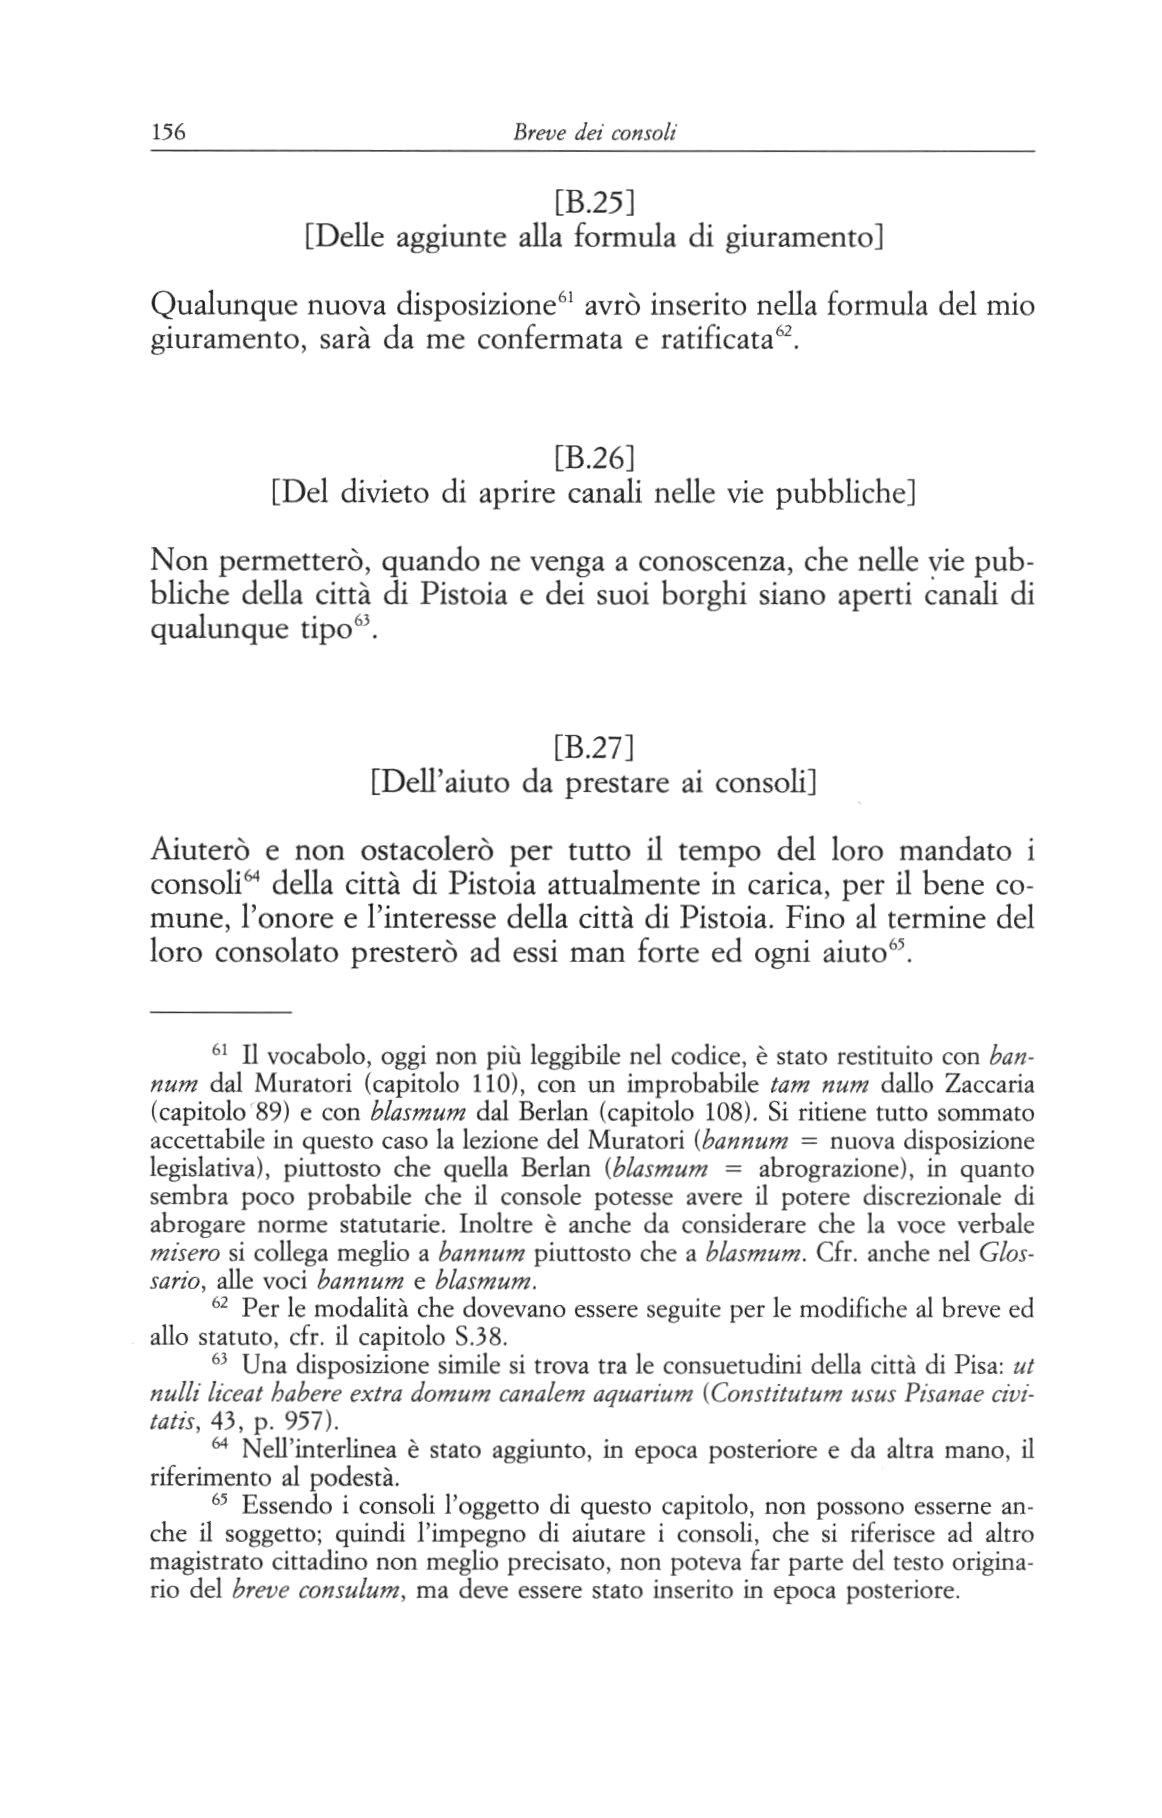 statuti pistoiesi del sec.XII 0156.jpg